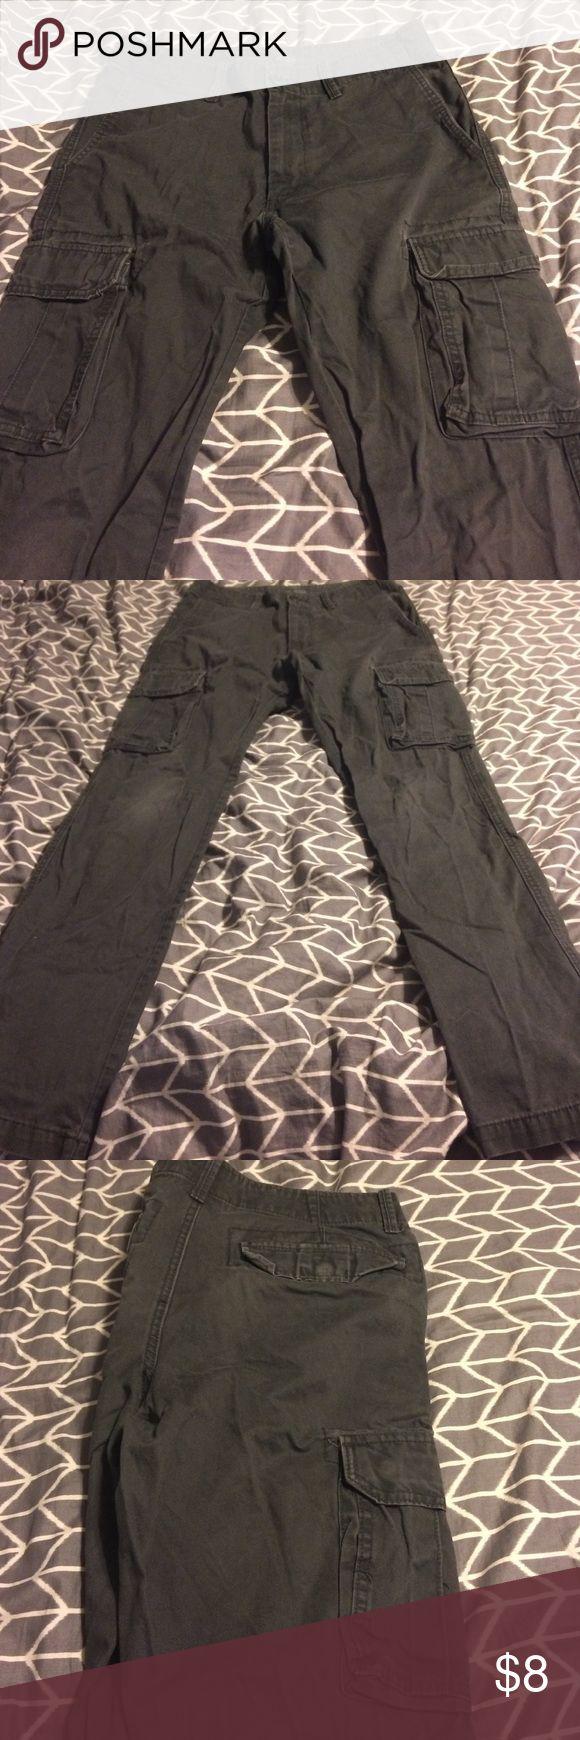 Men's old navy cargo pants 31x34 Men's old navy gray broken-in cargo pants. Size 31x34. Great used condition Old Navy Pants Cargo